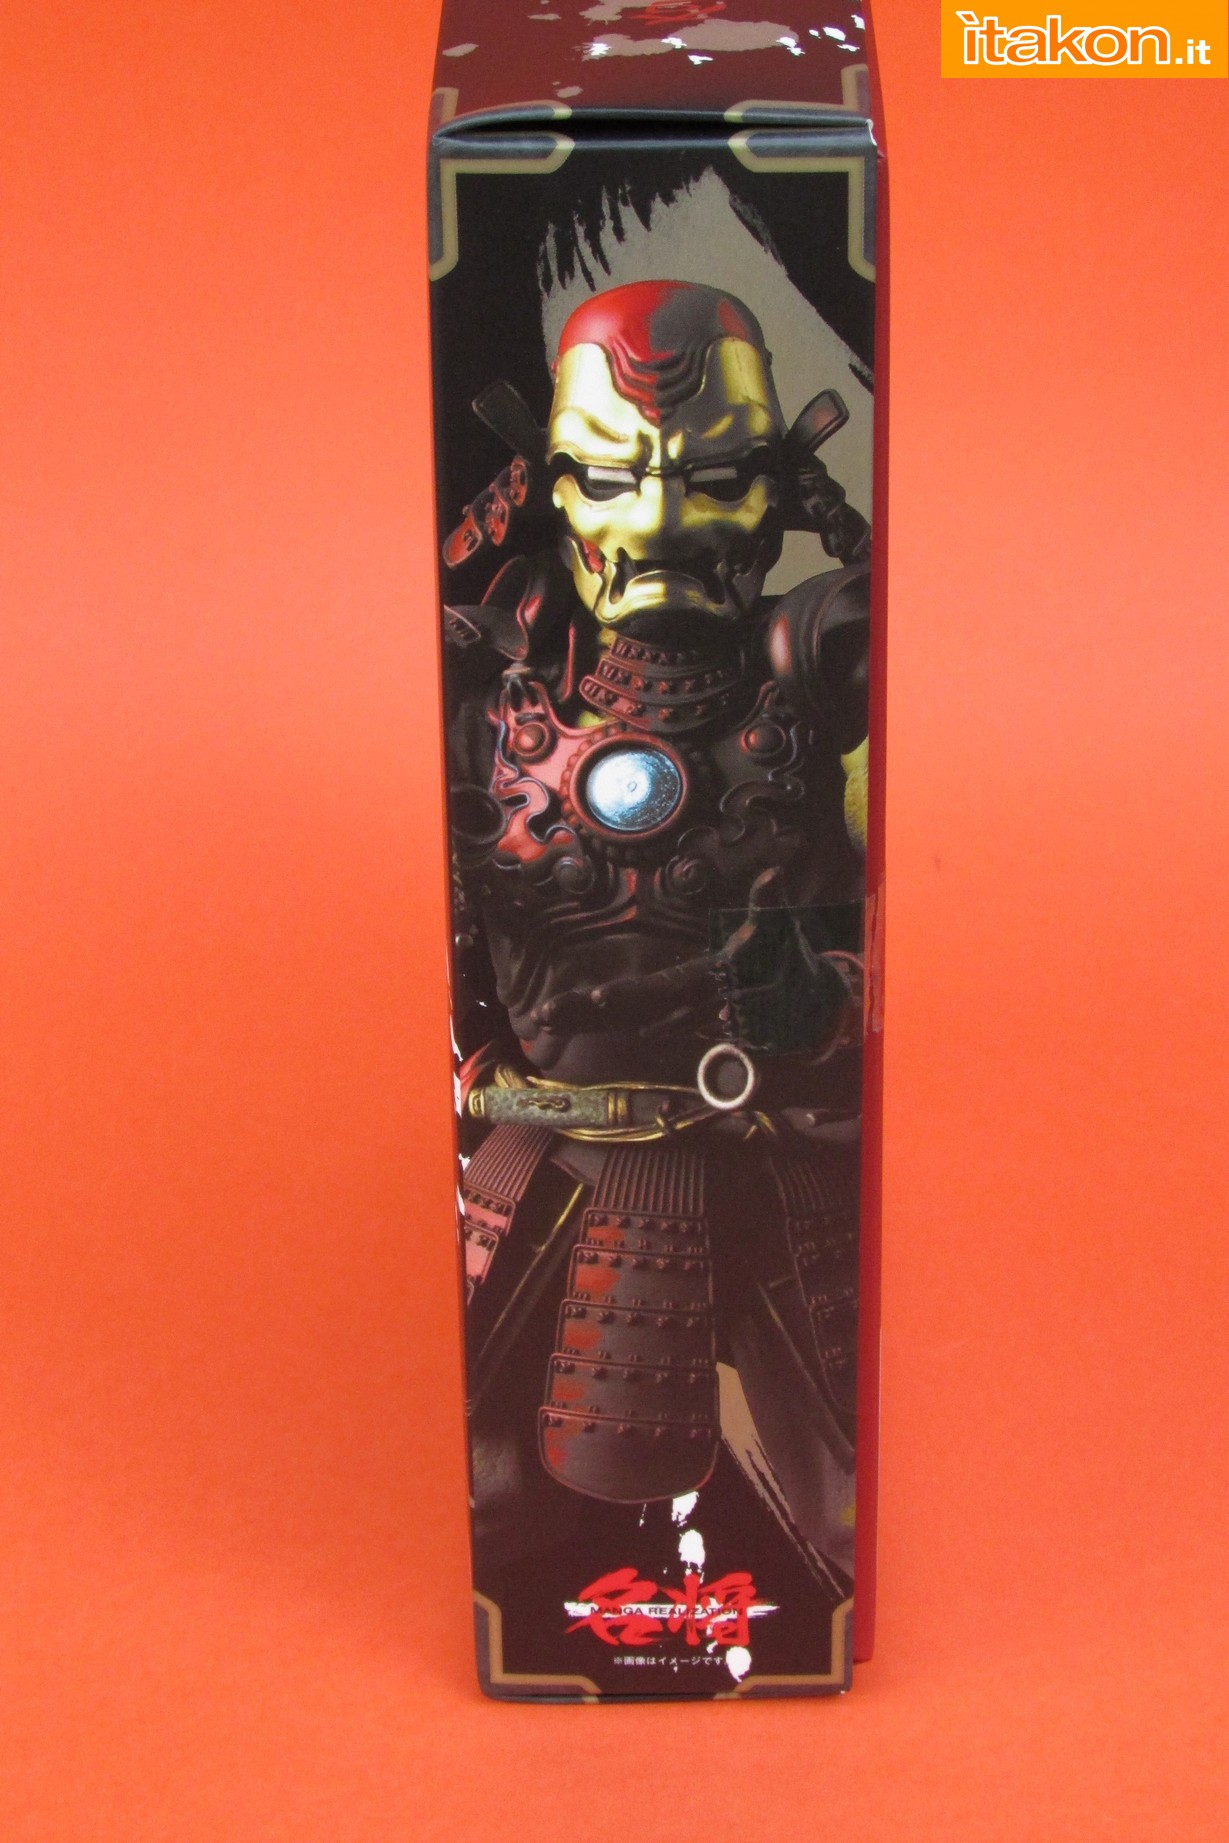 Link a Marvel Comics Koutetsu Samurai Iron Man Mark 3 Meishou MANGA REALIZATION review Bandai Itakon.it06